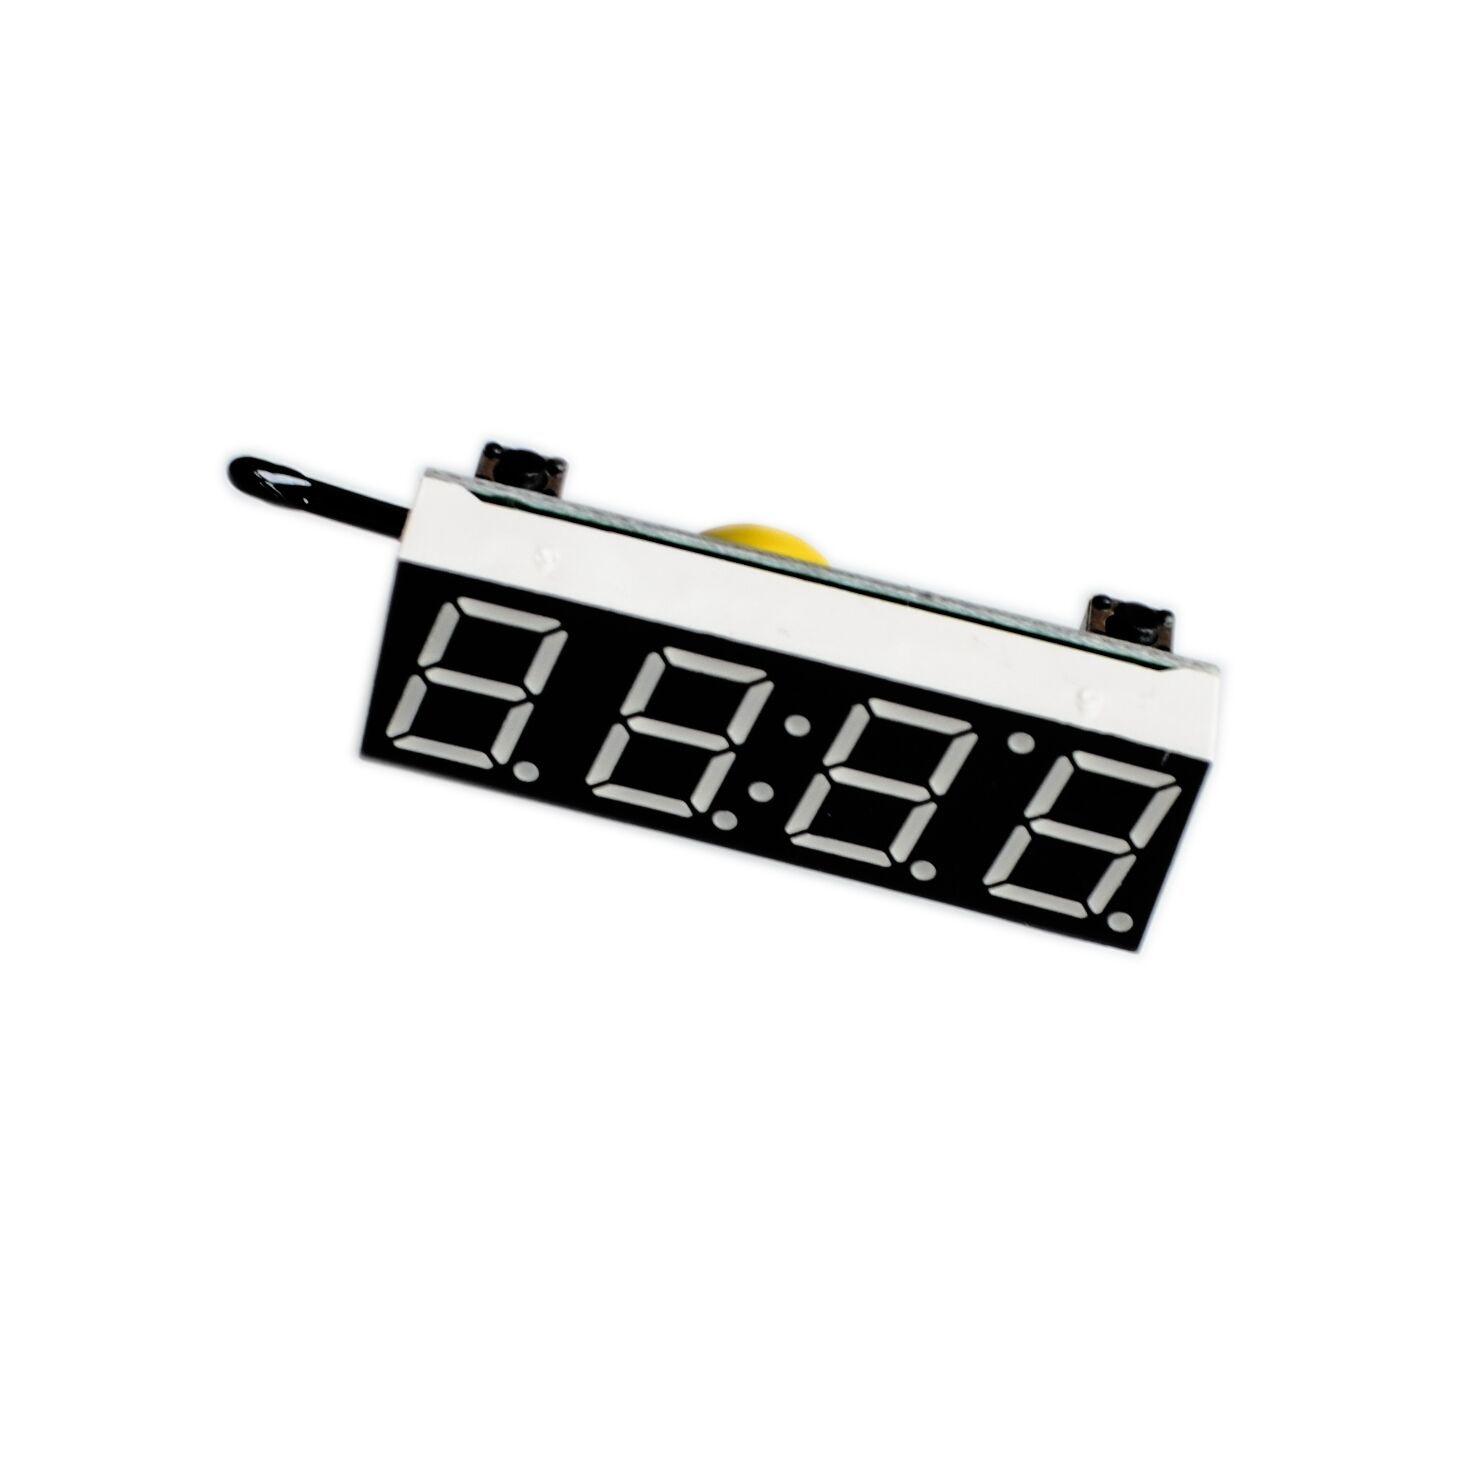 3 in 1 diy digital clock temperature voltage kit r8205 5 30v dc electronic red blue green led